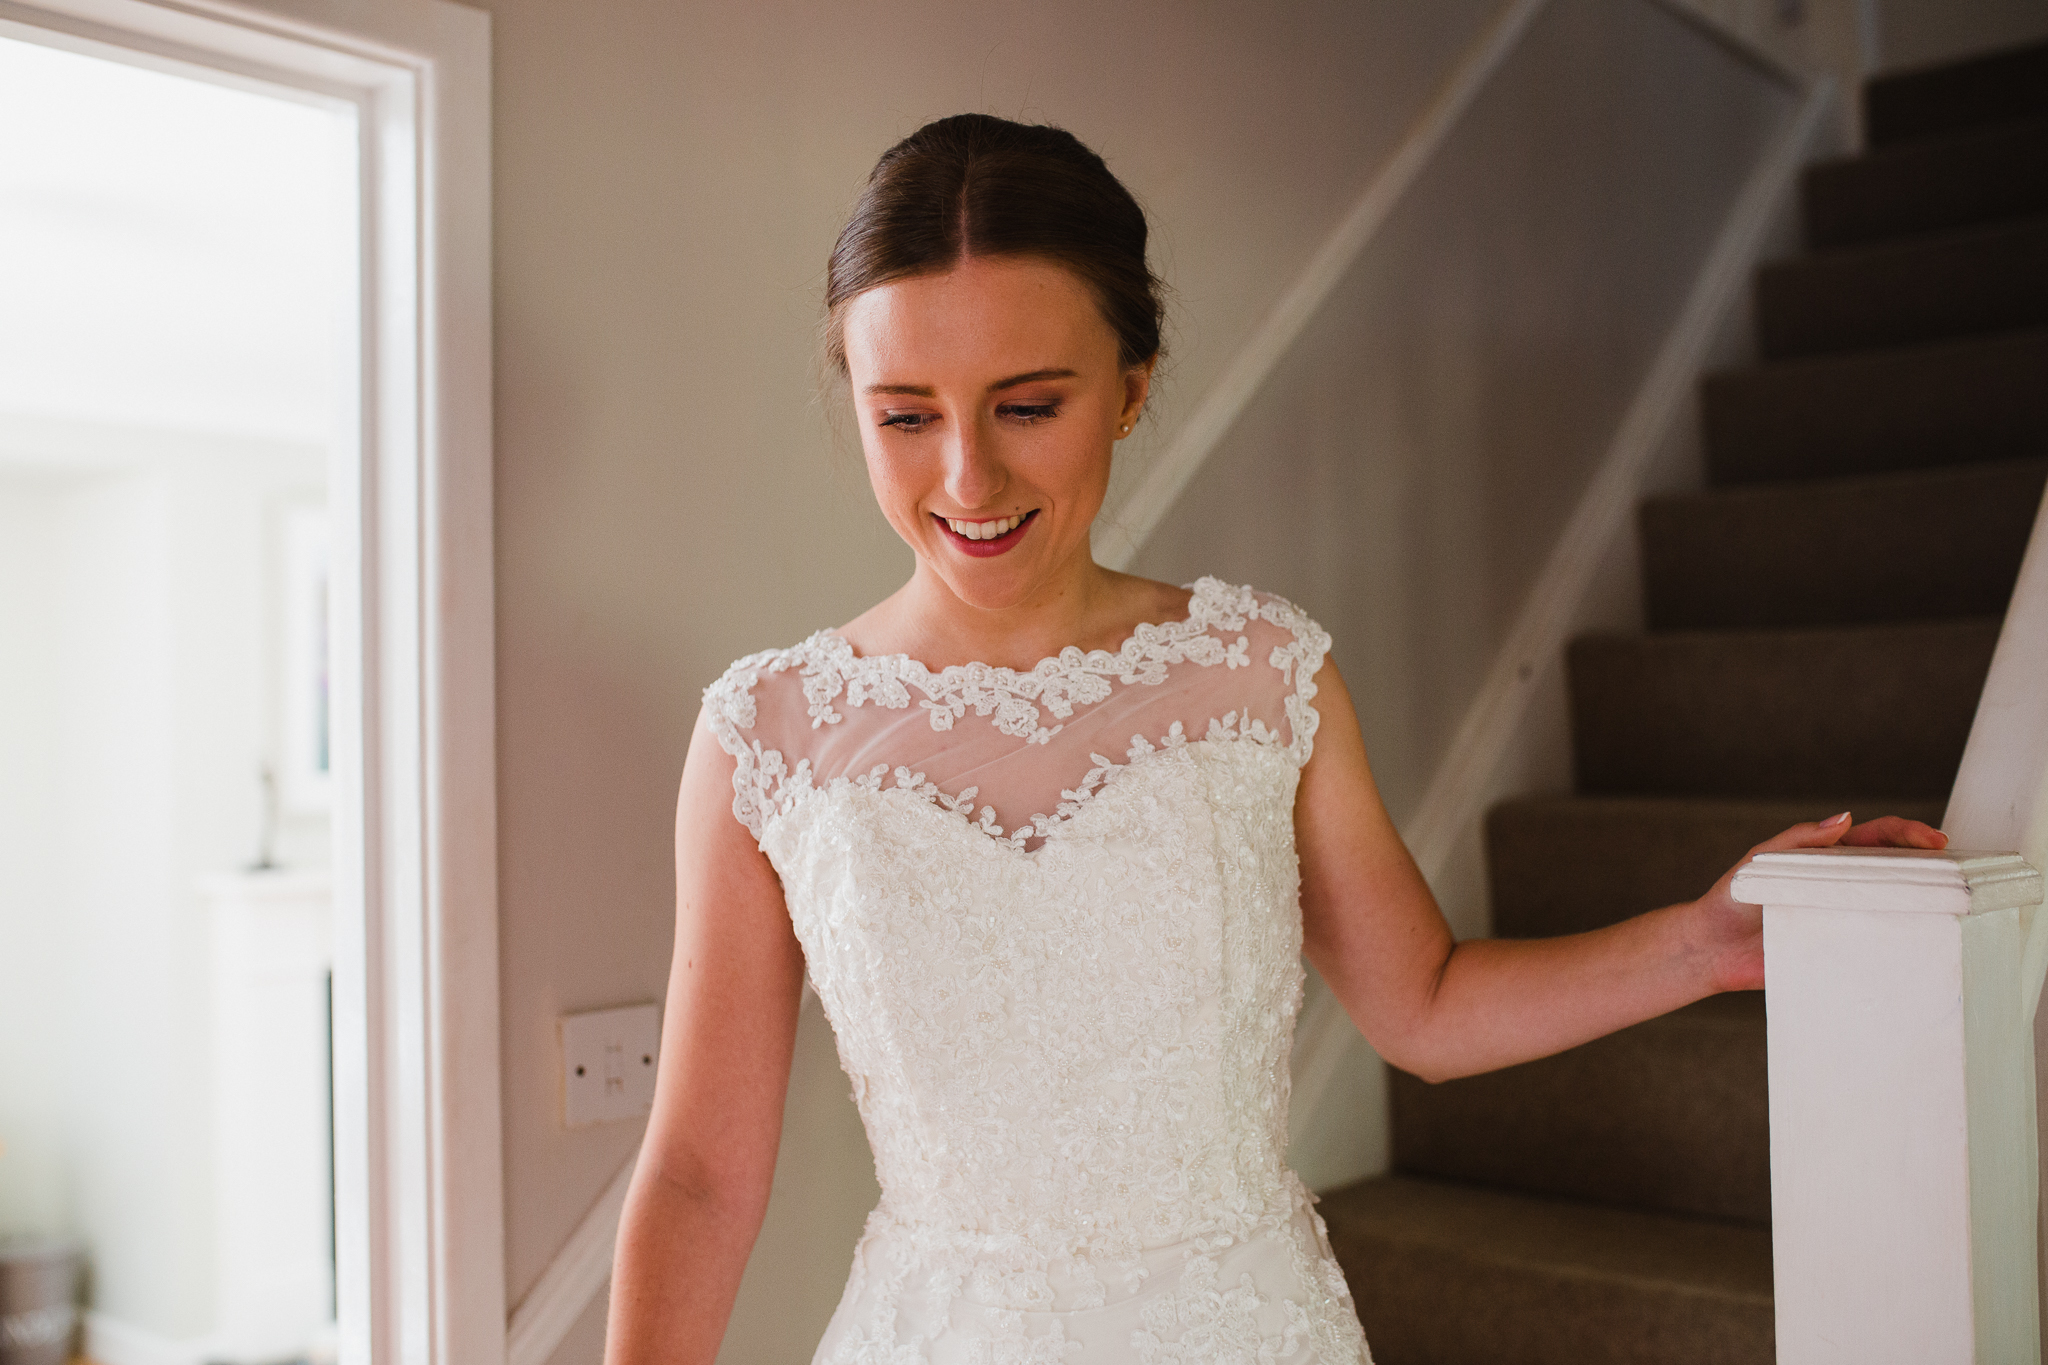 Jess and Ben - Liverpool Wedding - Jess smiling